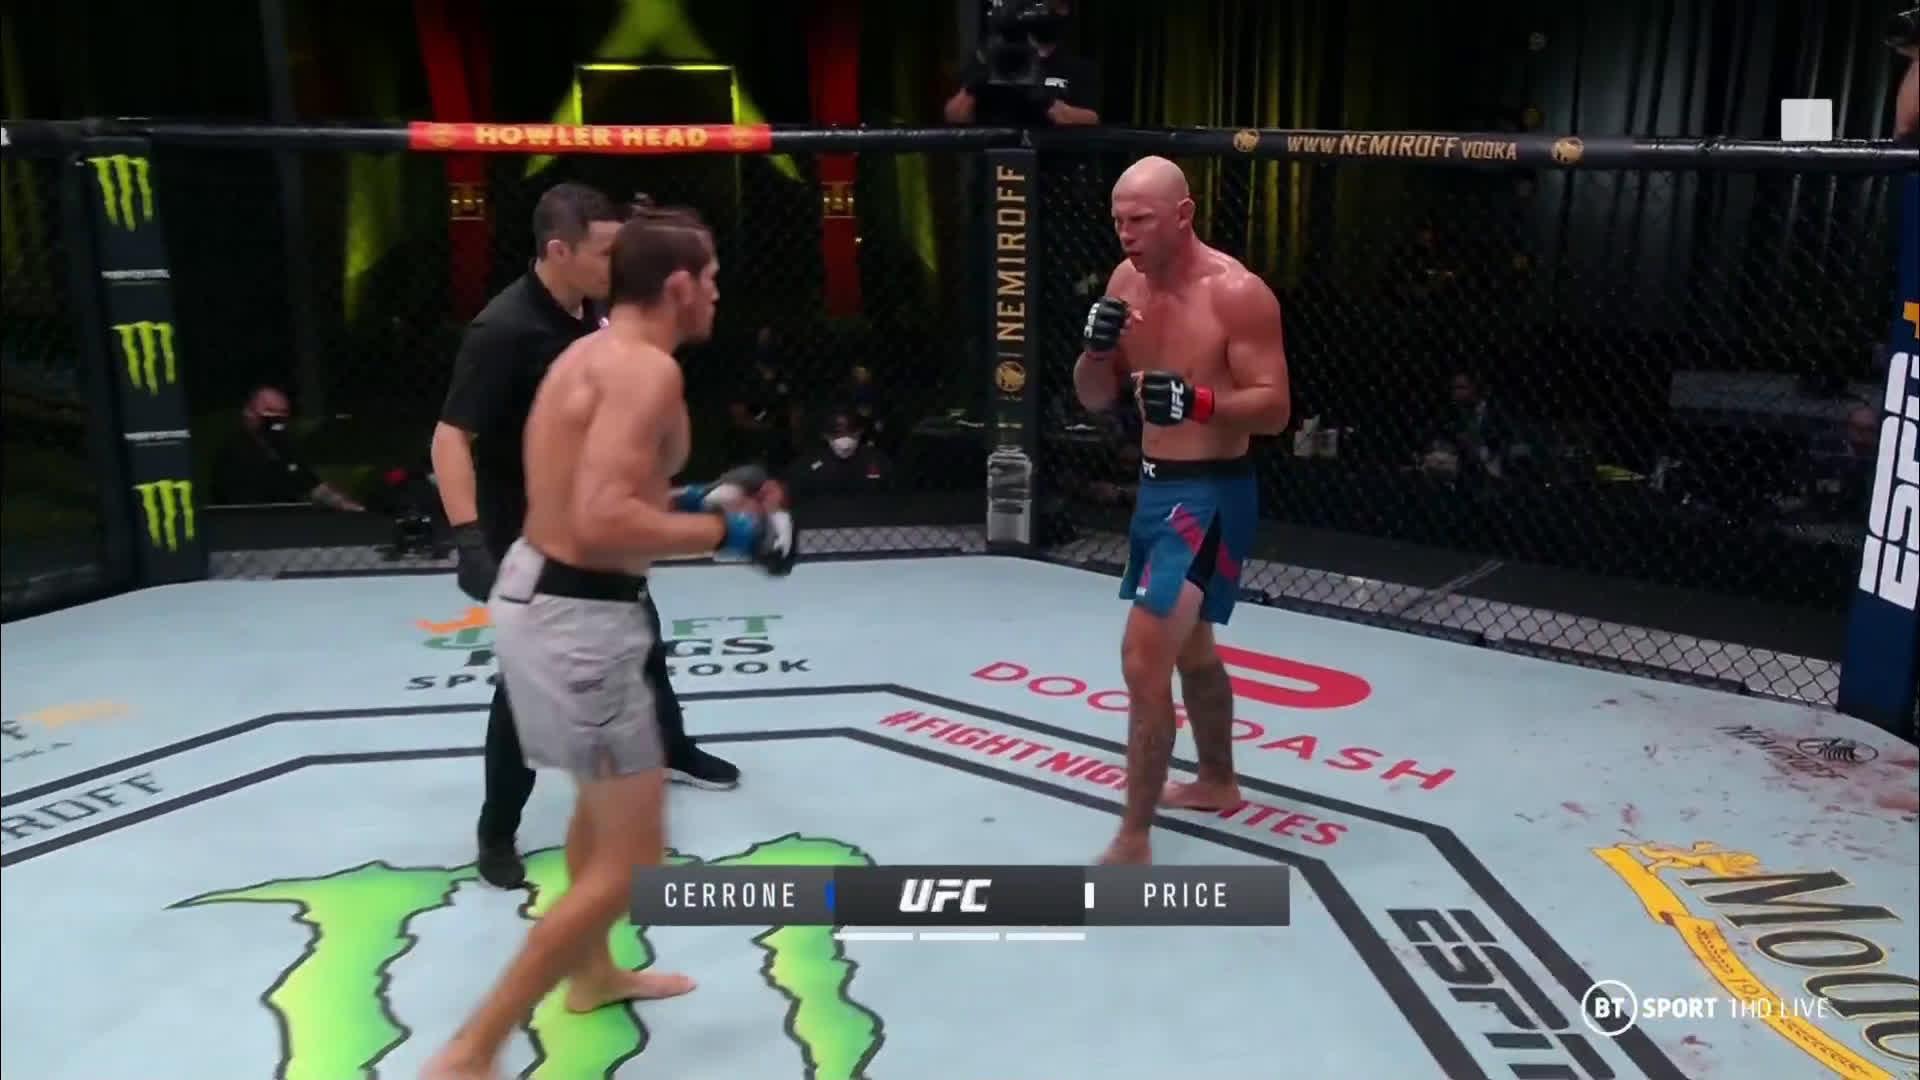 [SPOILER] Funny moment in main card fight involving Jason Herzog